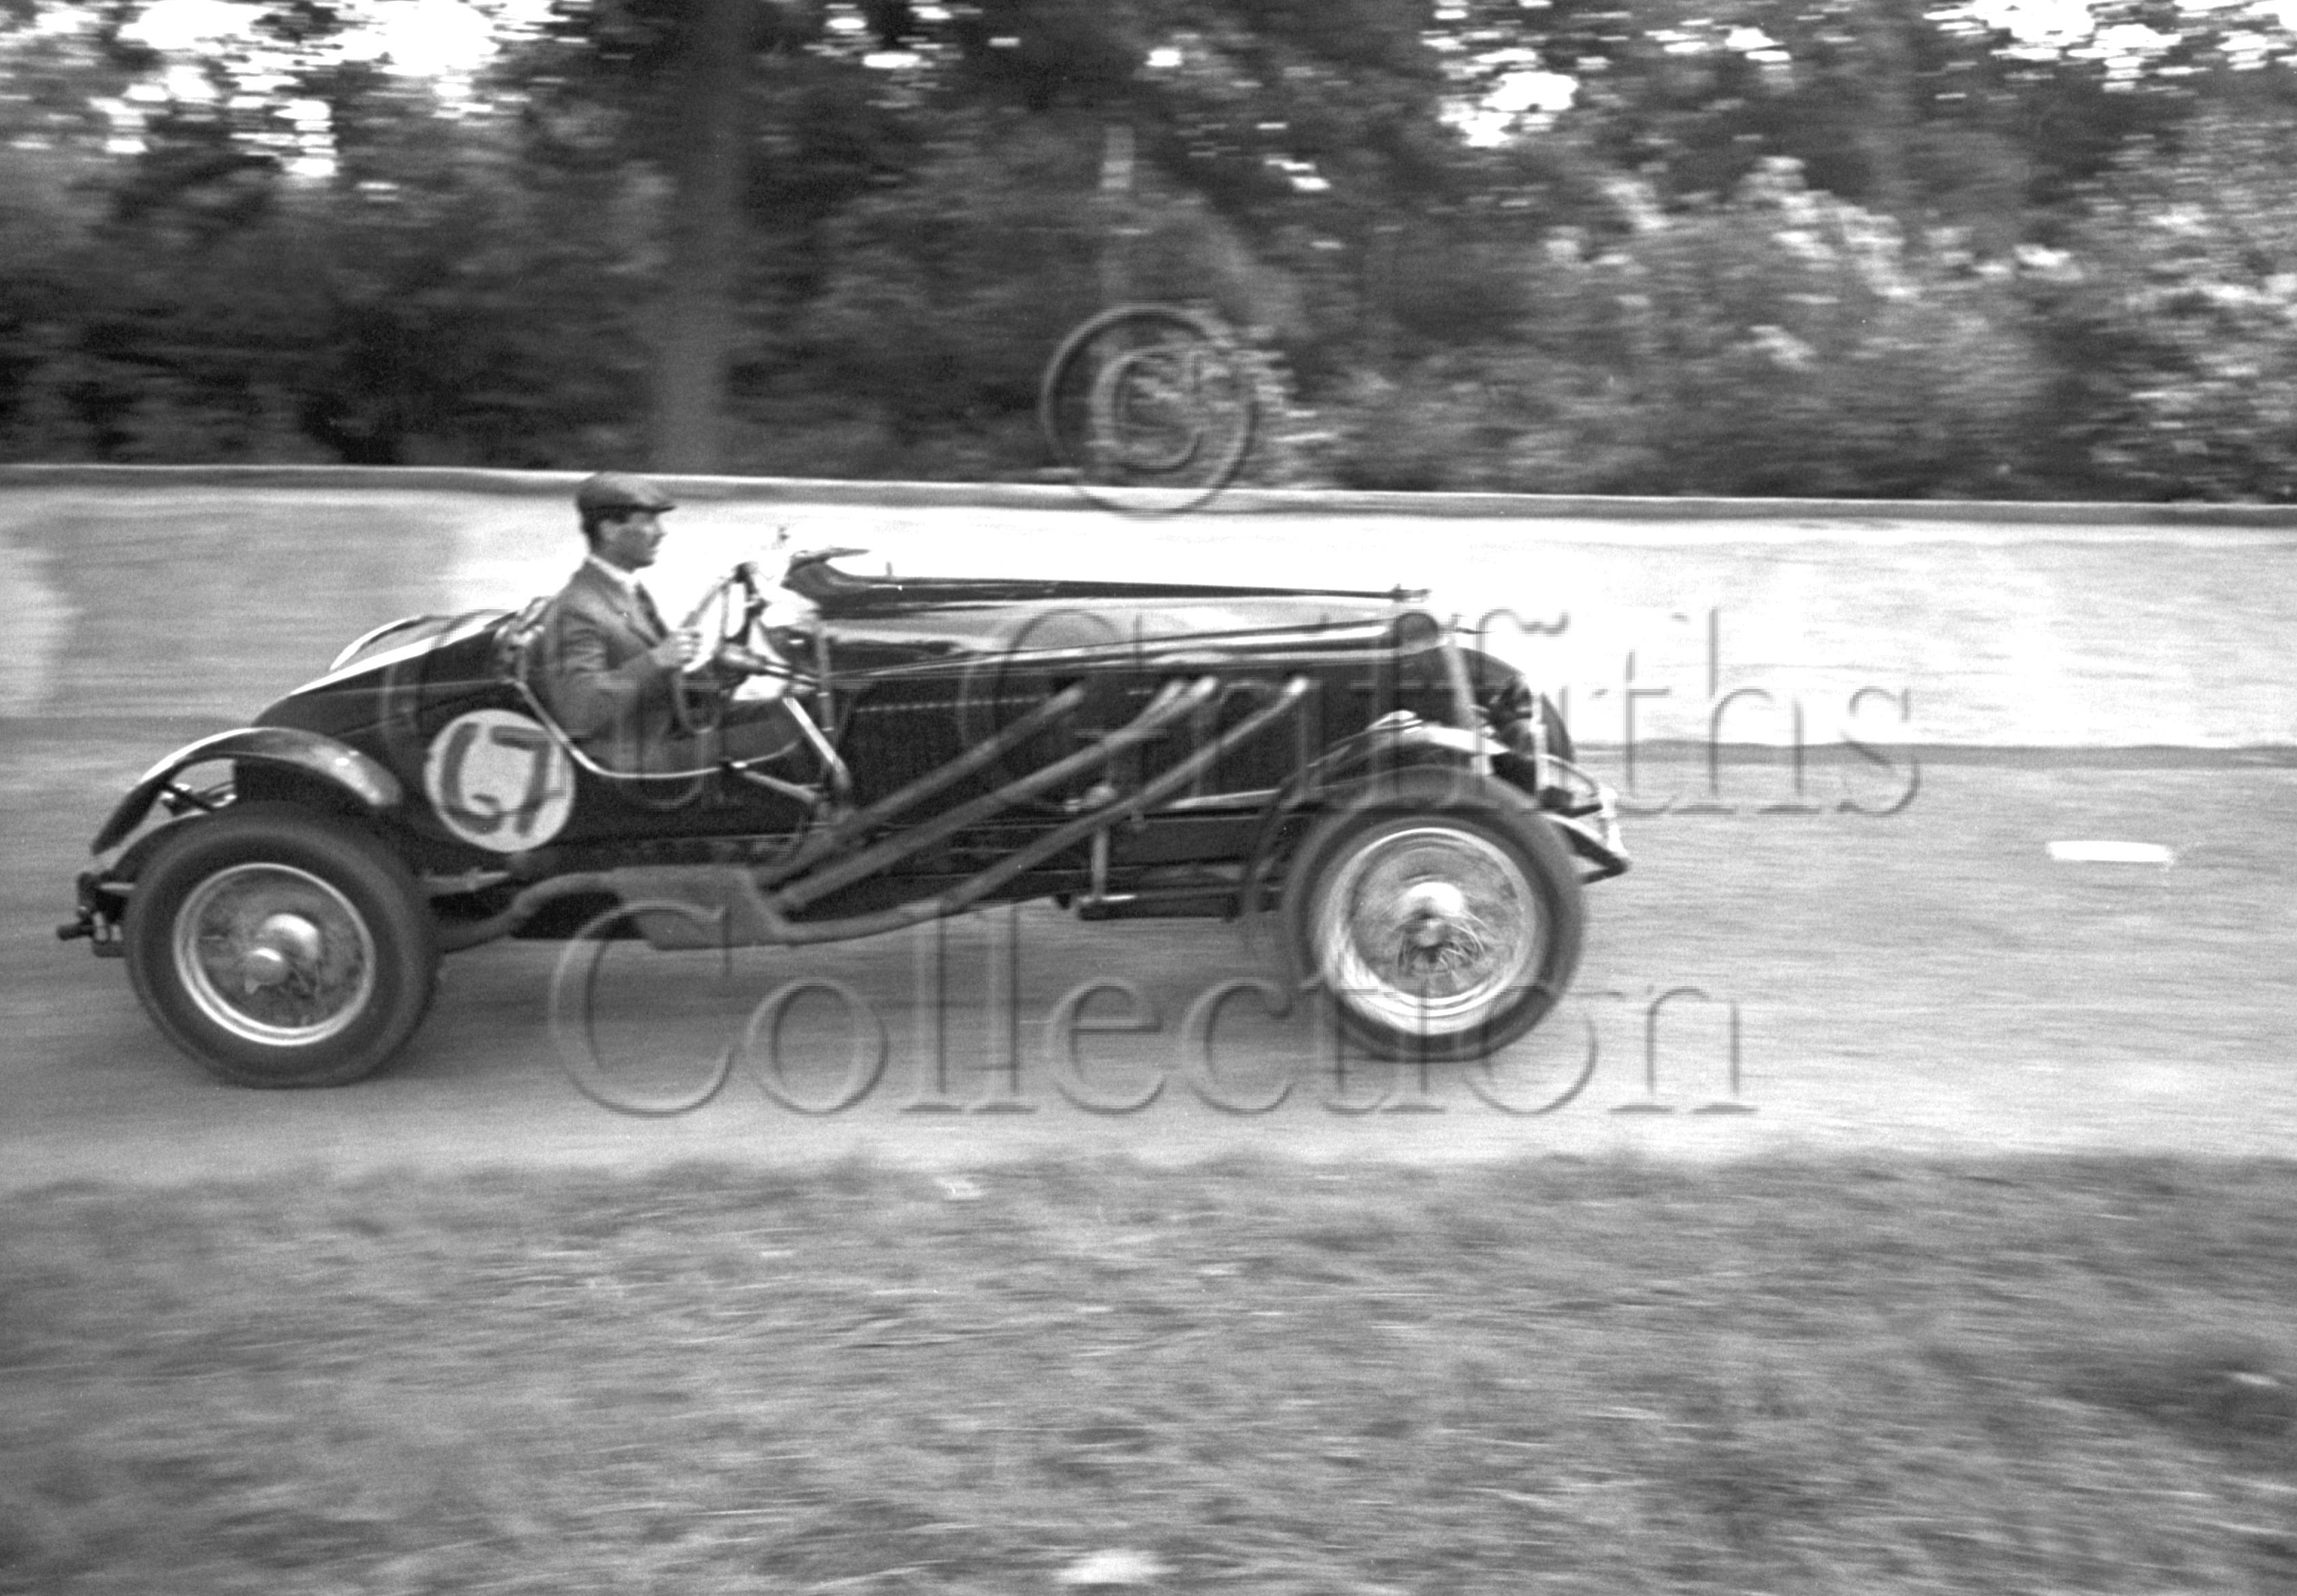 34-183–P-J-E-Binns–Vauxhall–Great-Auclum–23-07-1950.jpg - Guy Griffiths Collection